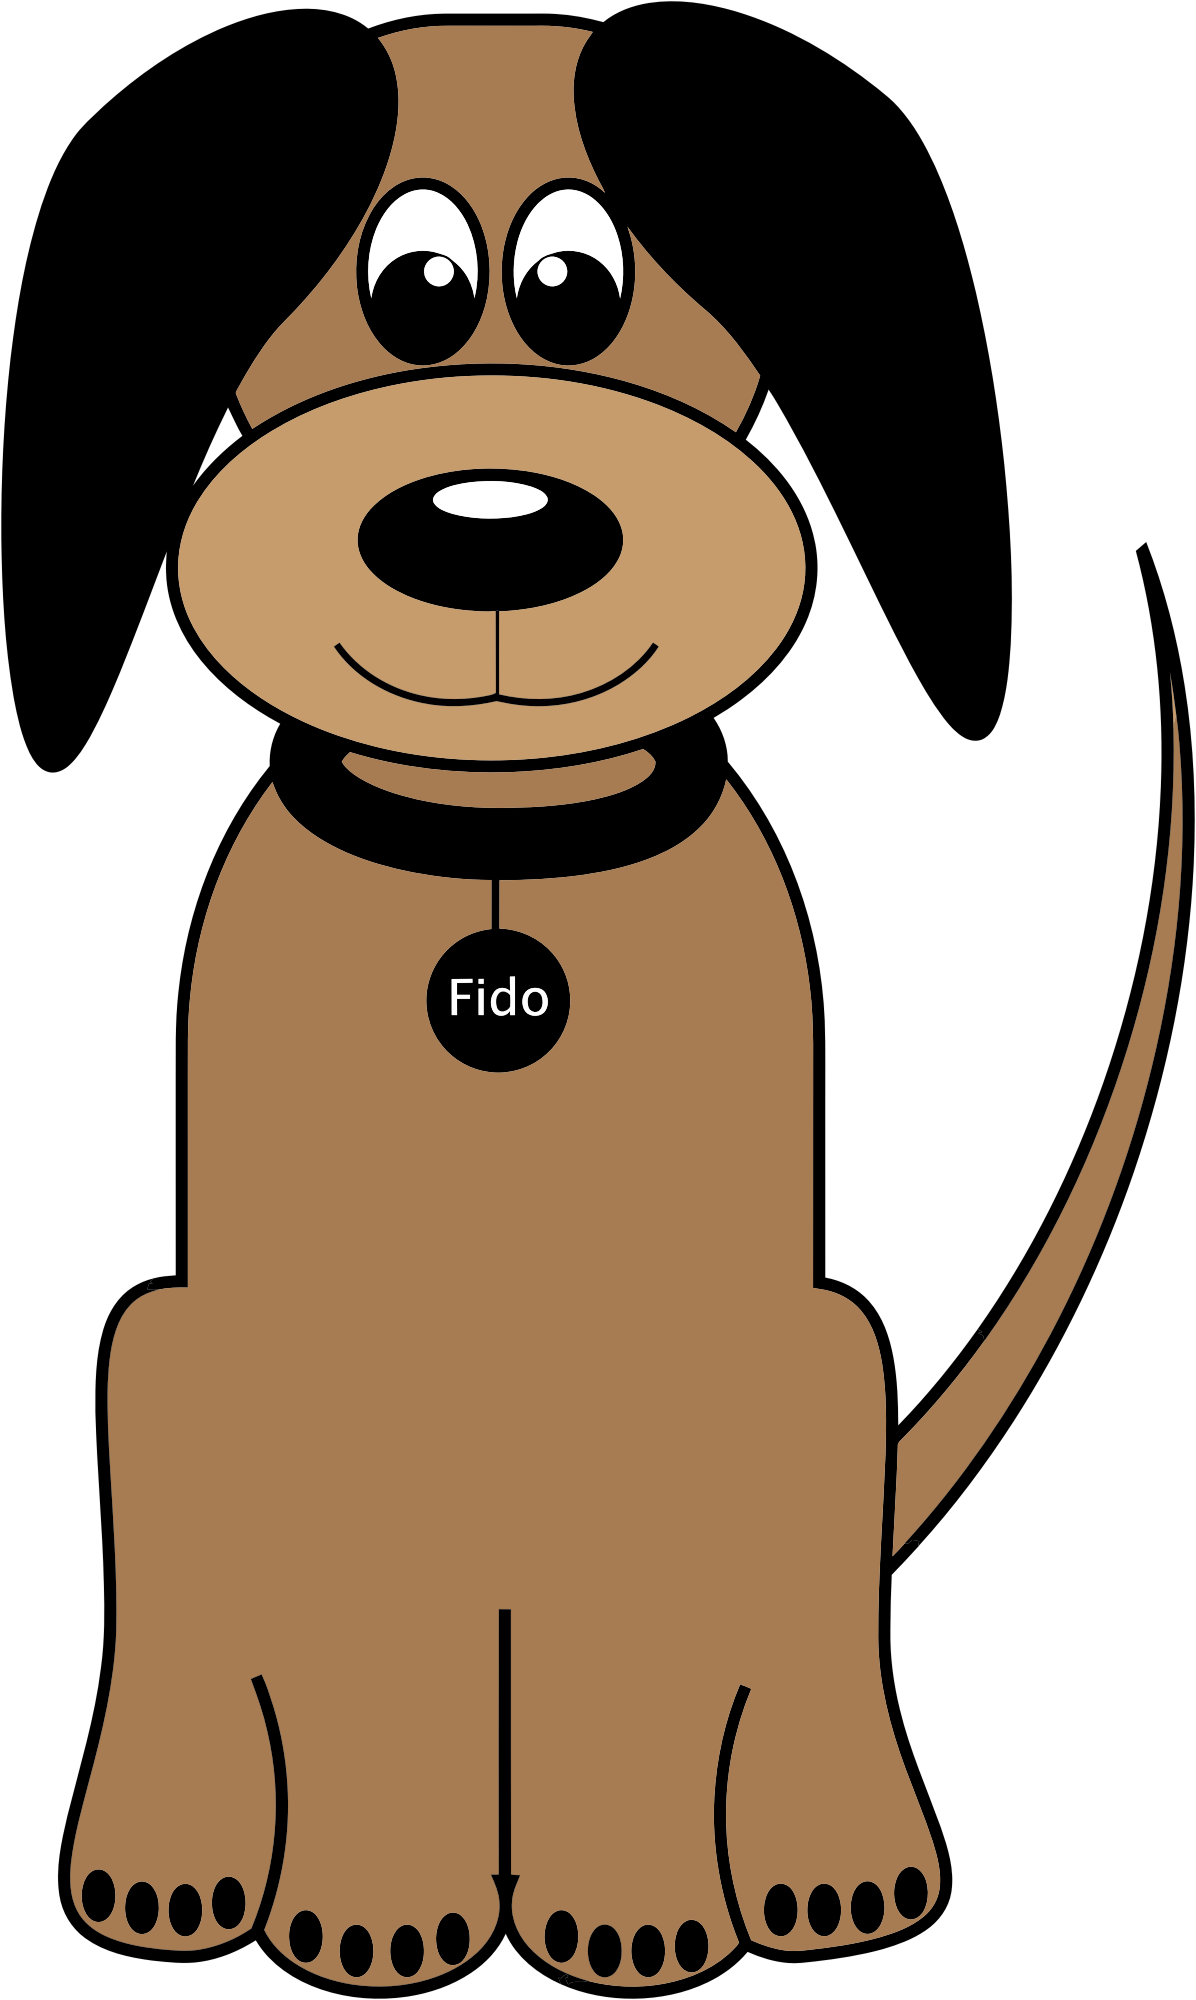 Cartoon fido big image. Dog training clipart